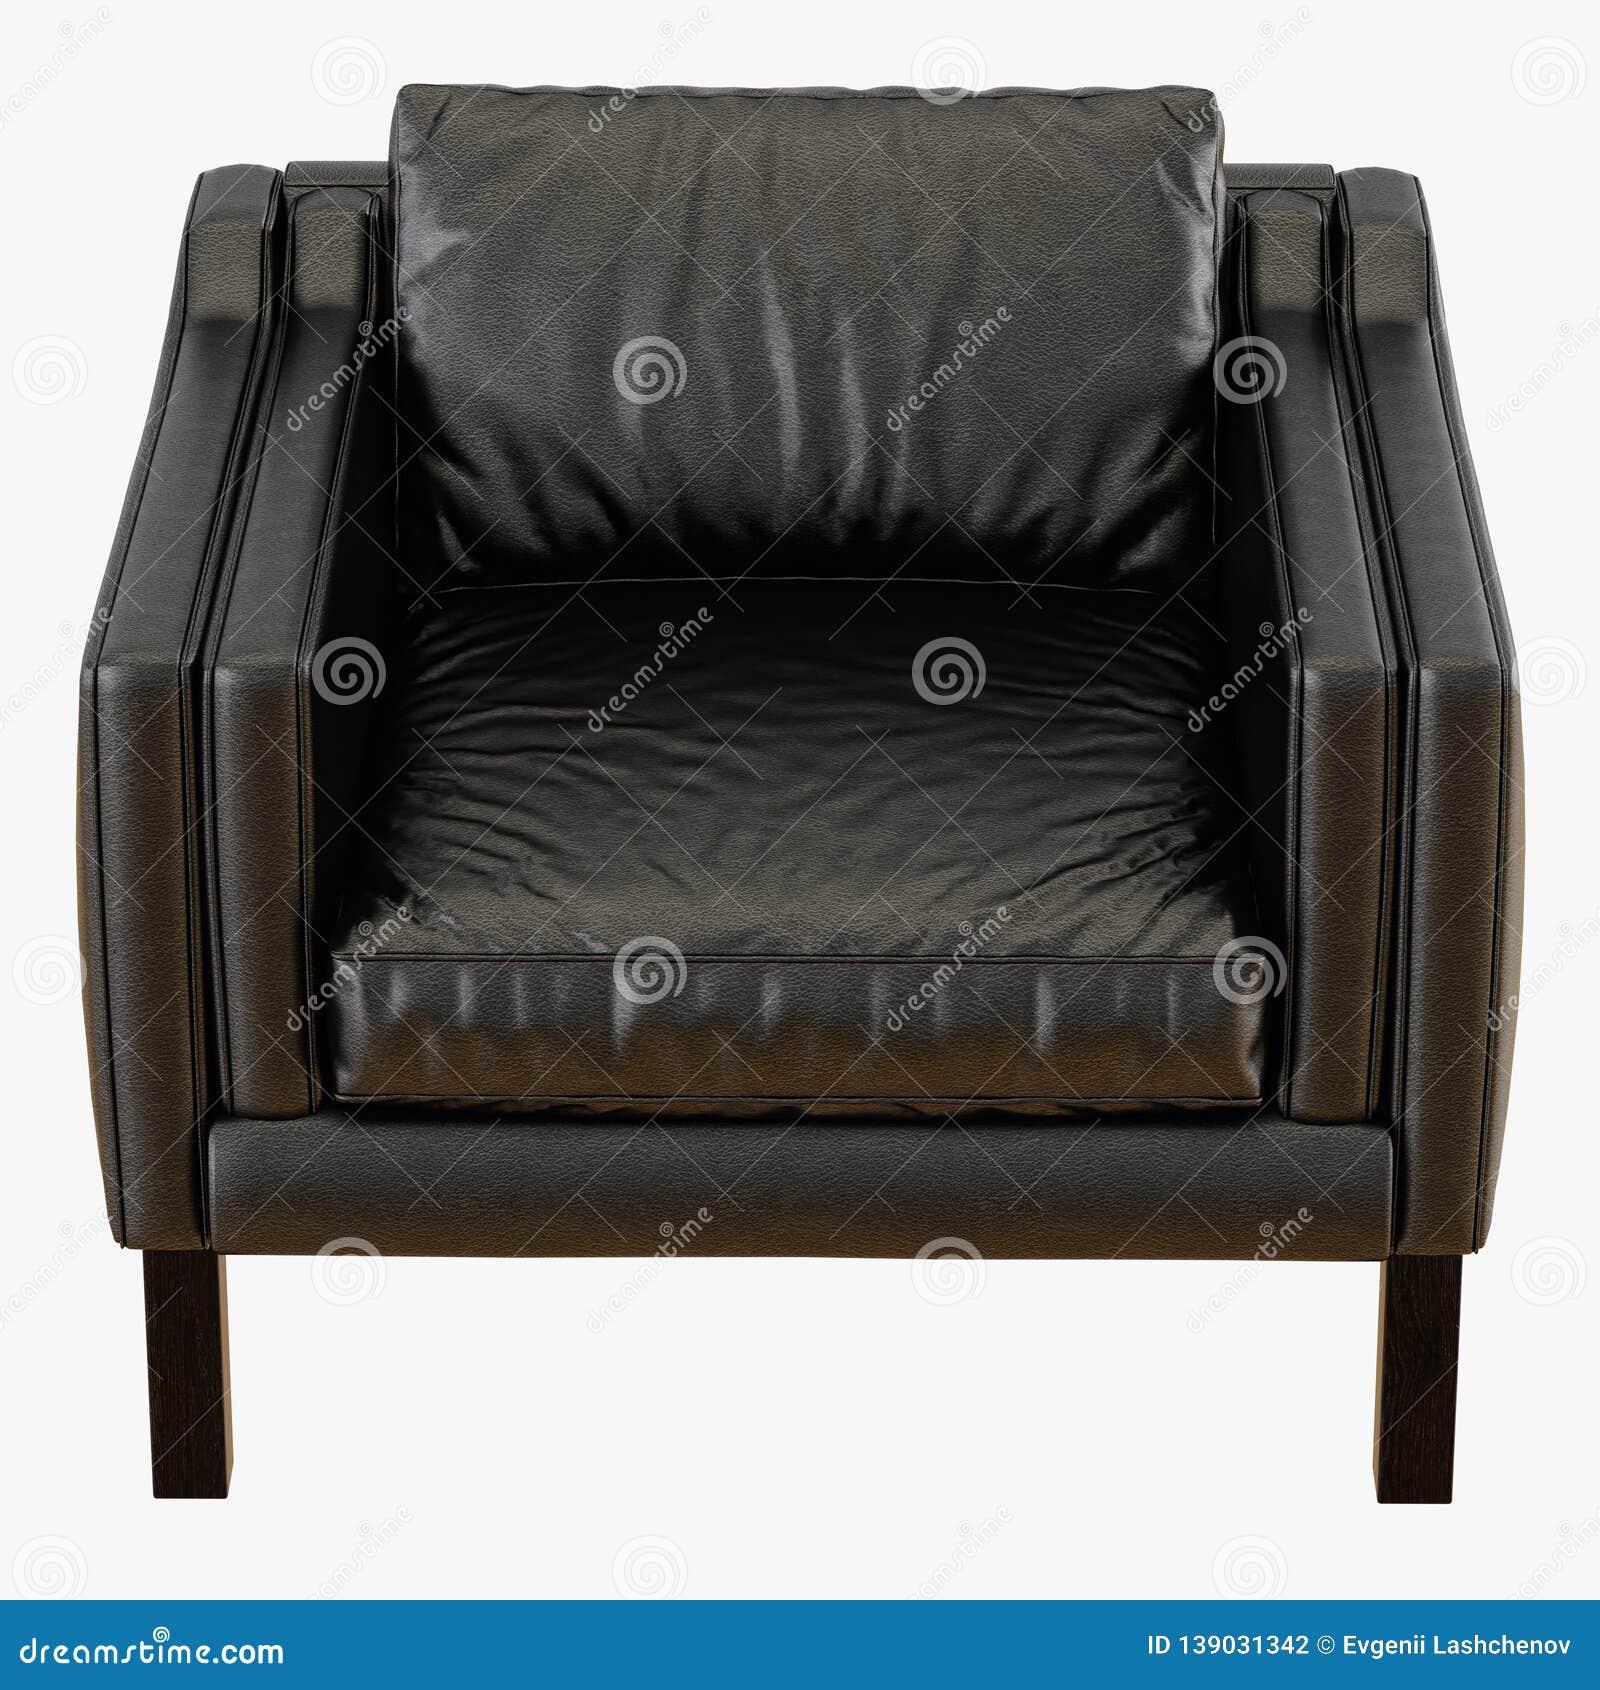 Astounding Soft Black Leather Armchair 3D Rendering On A White Dailytribune Chair Design For Home Dailytribuneorg